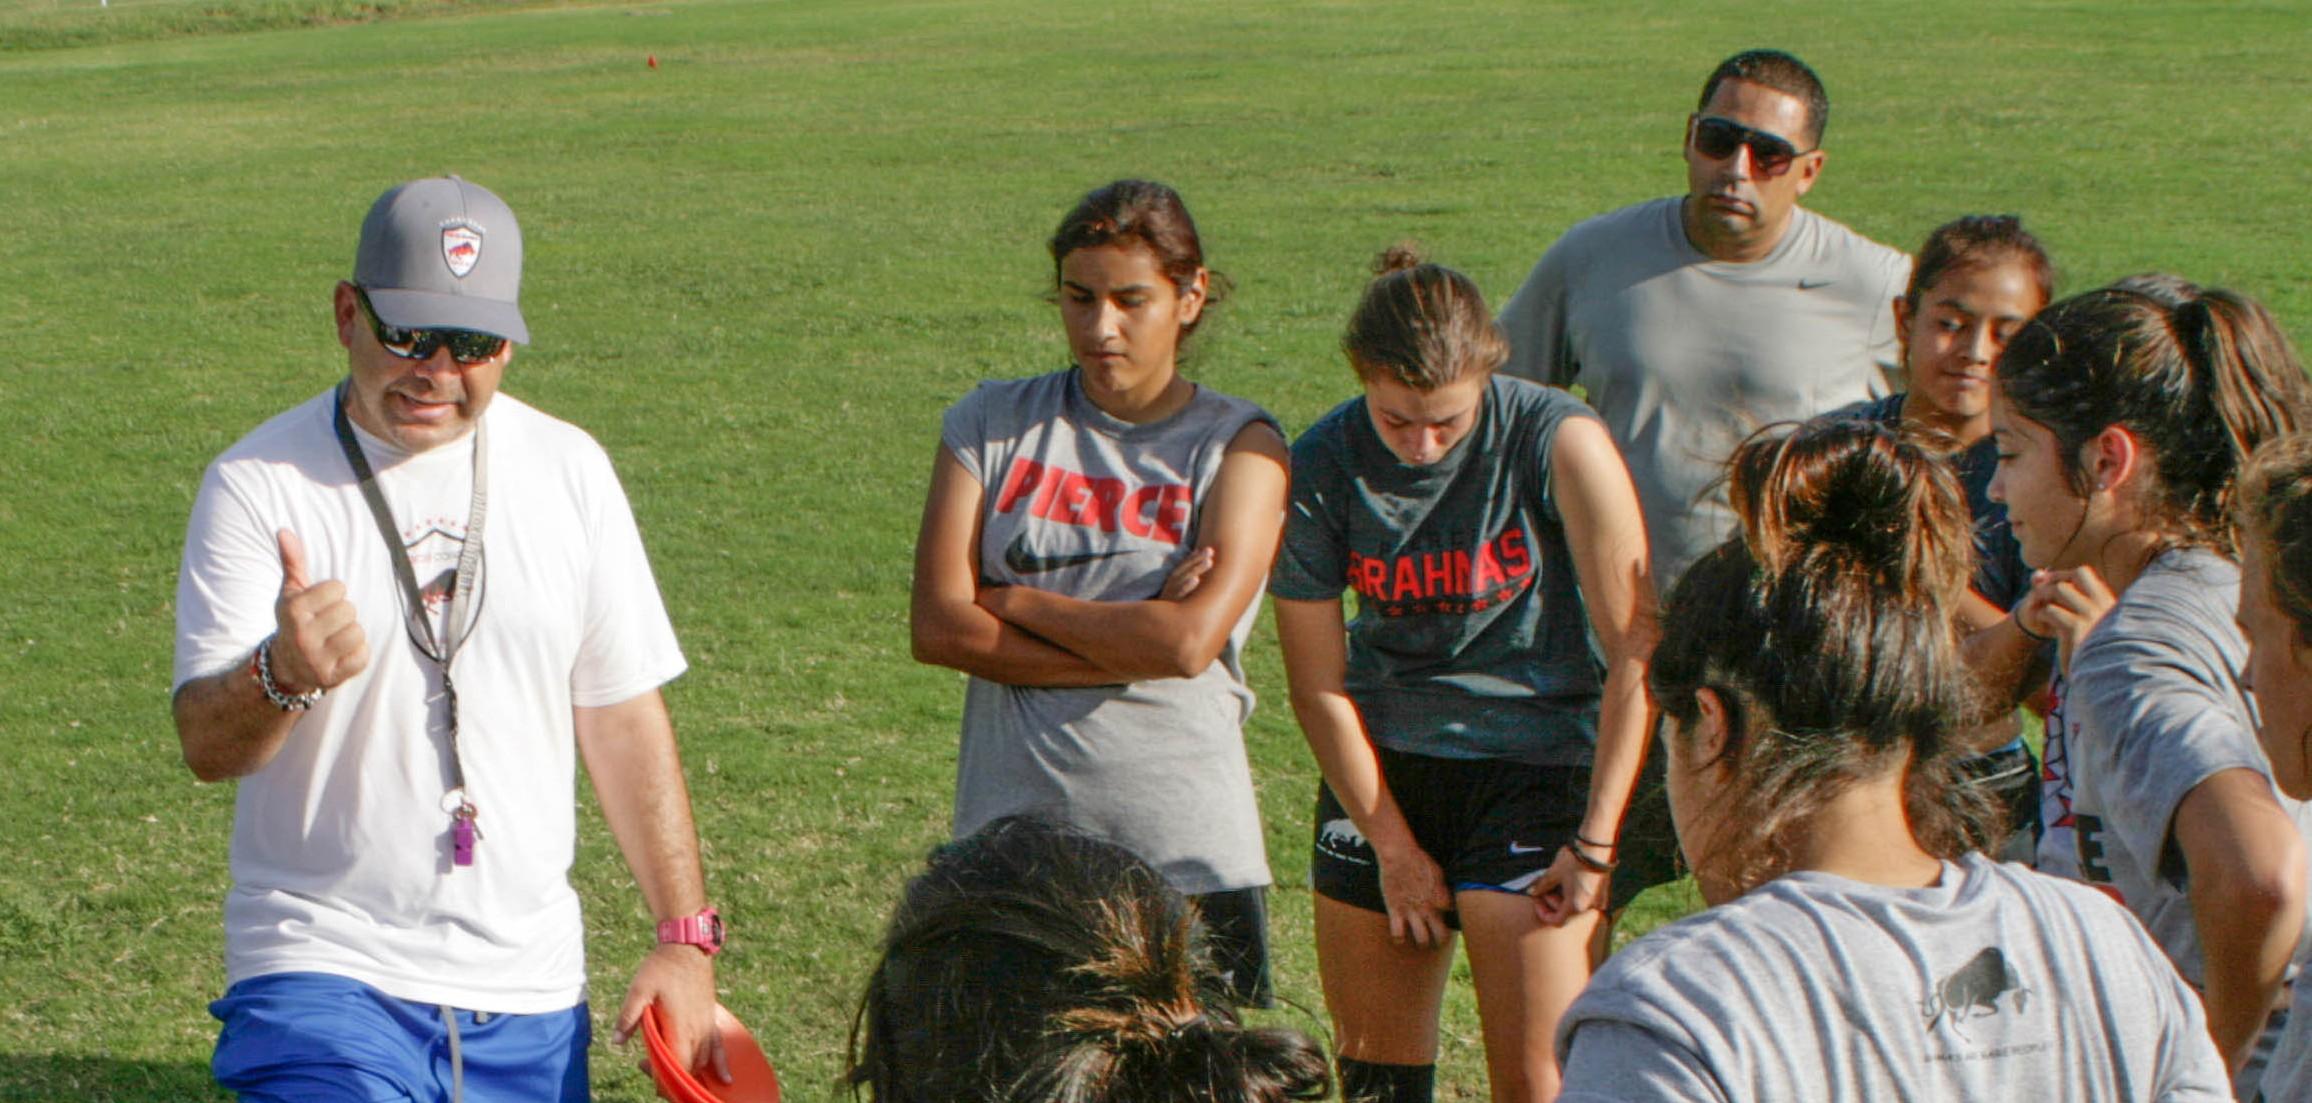 Coaching mentality